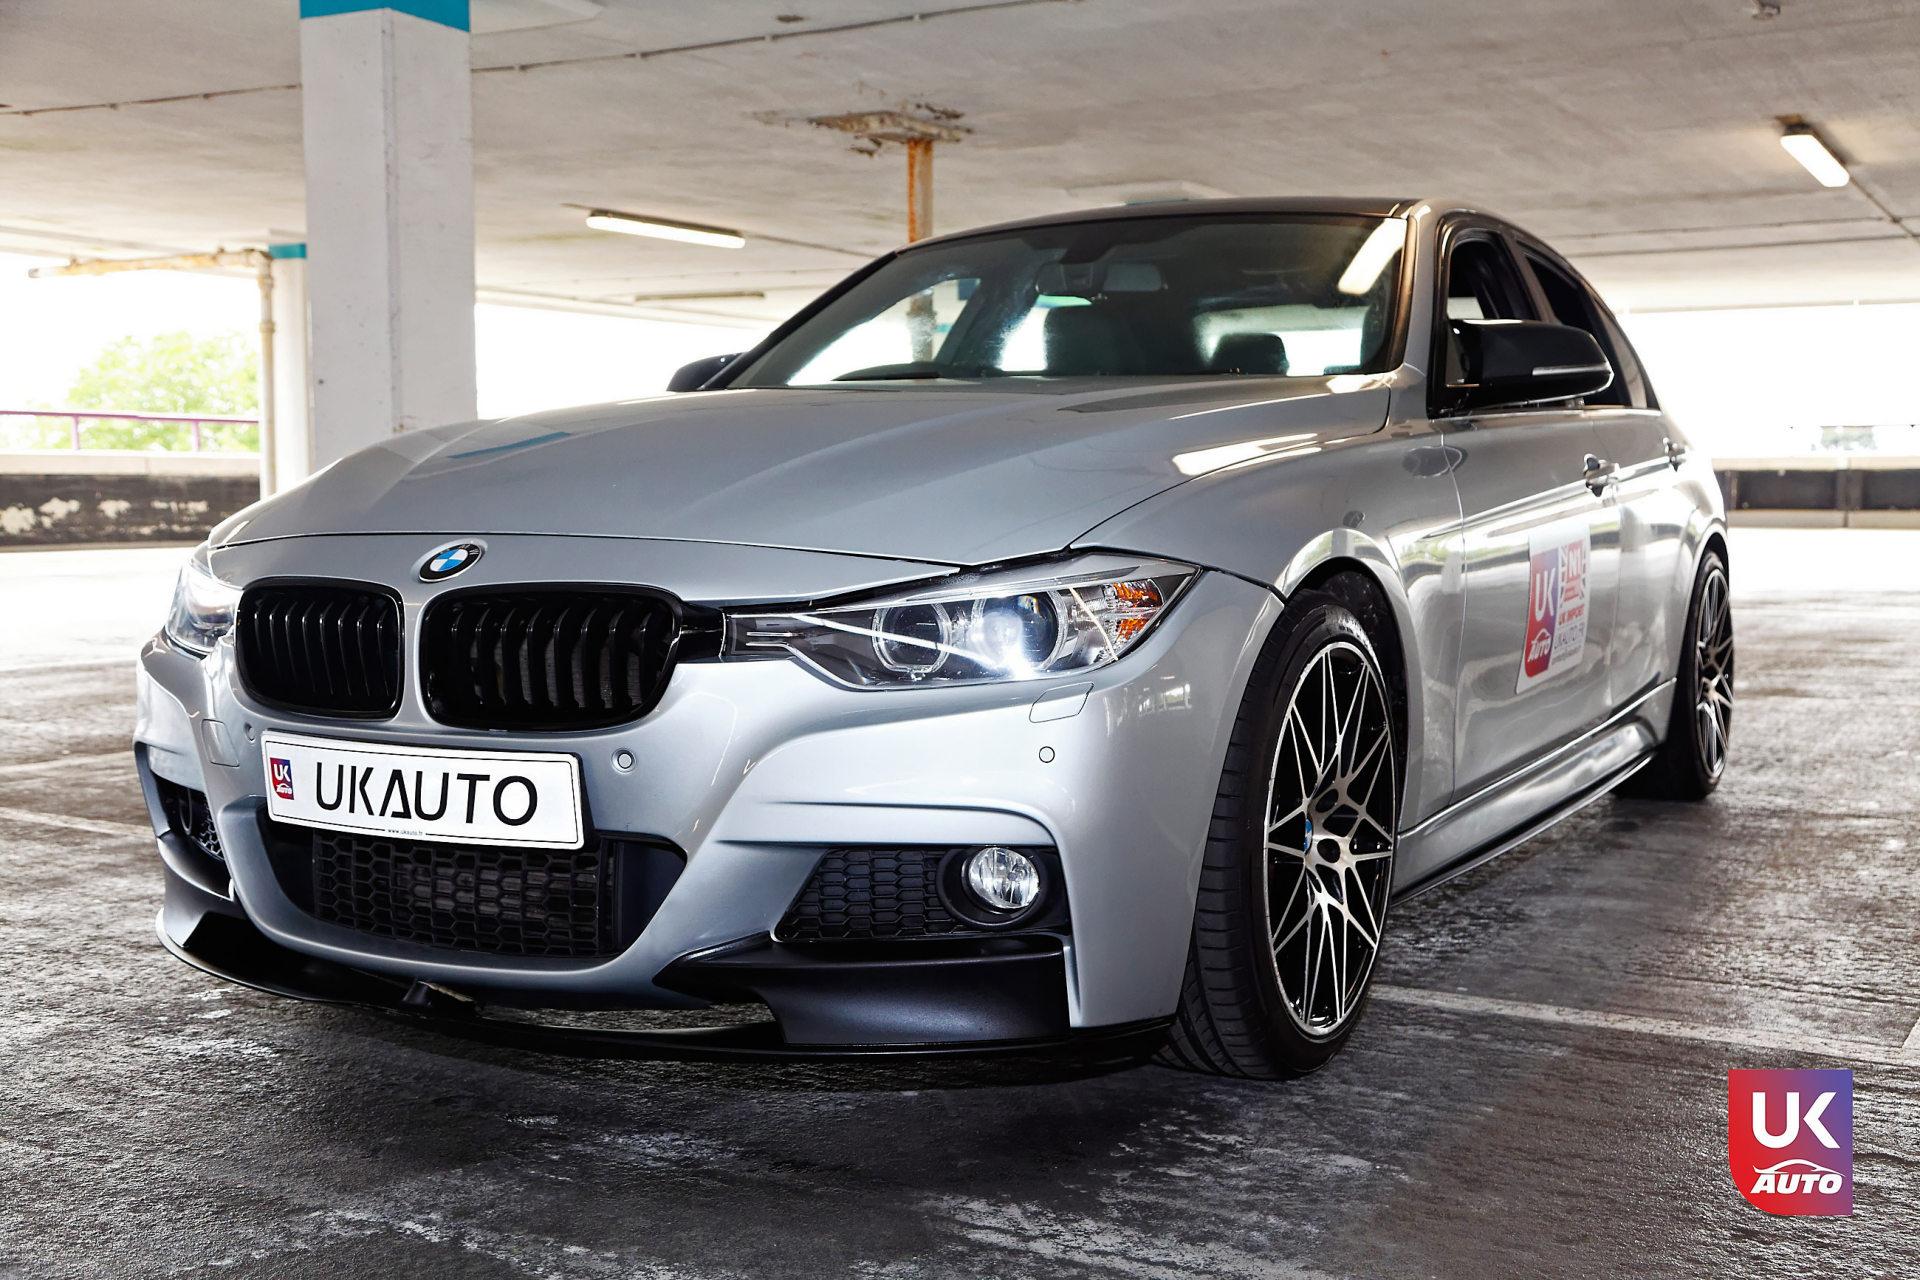 Bmw 335I IMPORT F30 eric drouet import bmw occasion rhd mandataire bmw angleterre2 DxO - IMPORTATION BMW 335 I FELICITATION A ERIC DROUET BMW VOITURE SPORTIVE UK